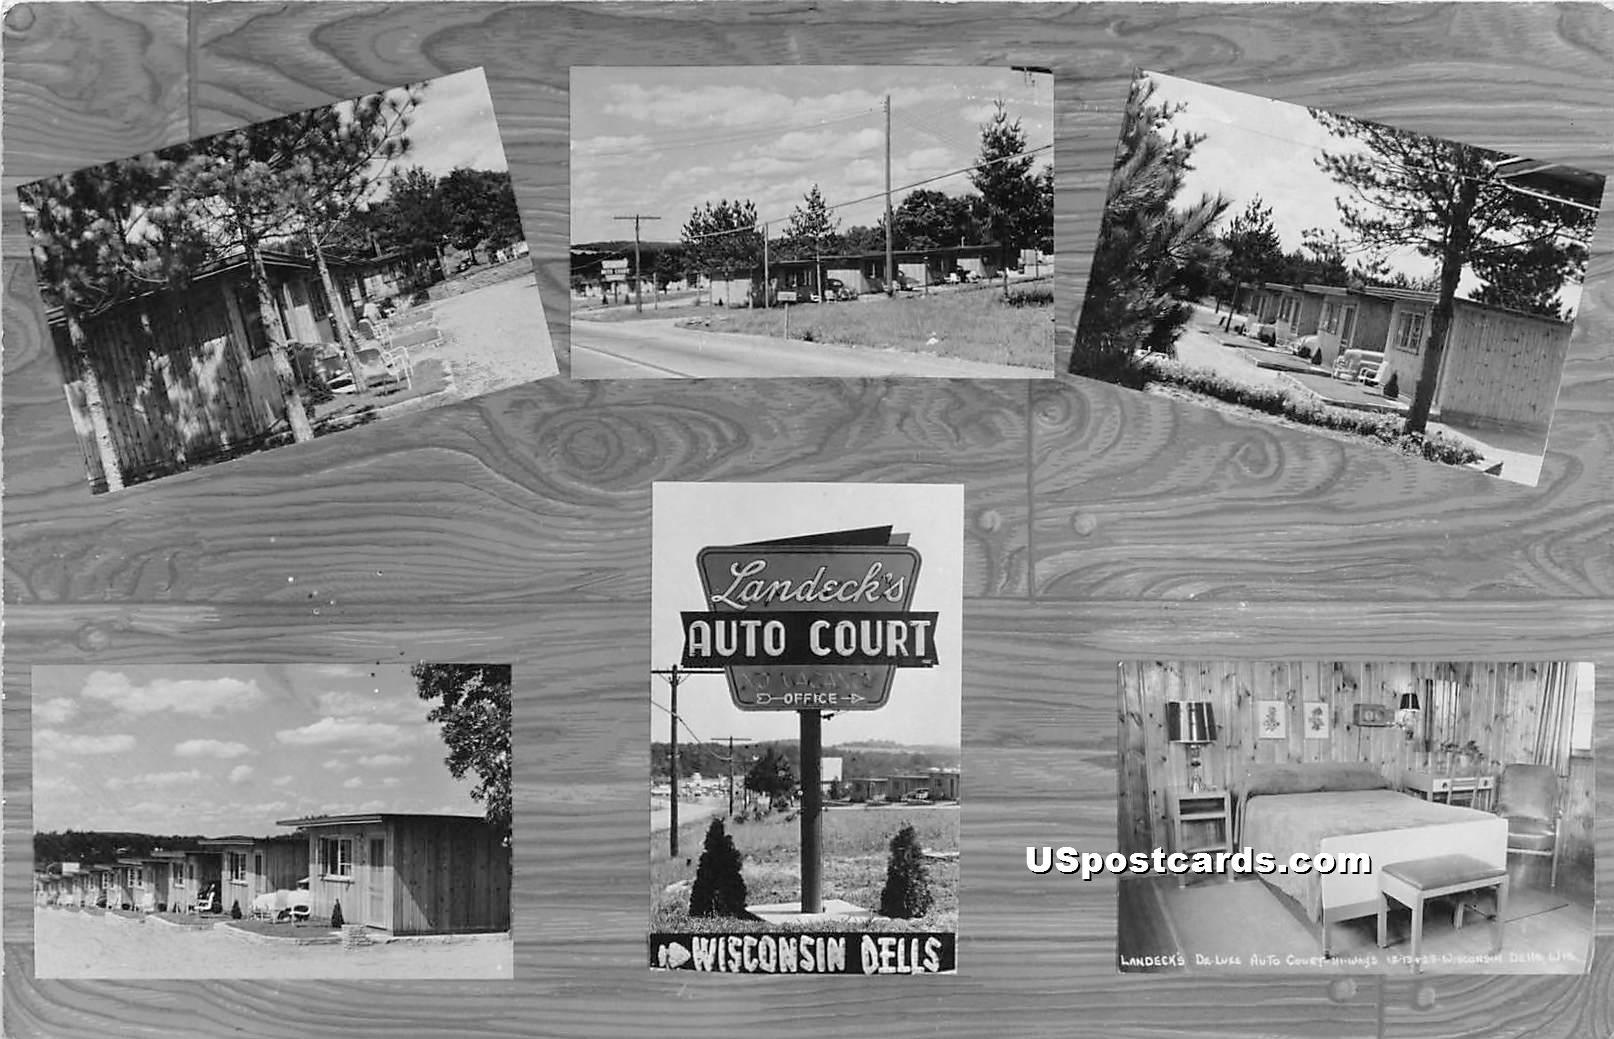 Landeck's Auto Court - Wisconsin Dells Postcards, Wisconsin WI Postcard